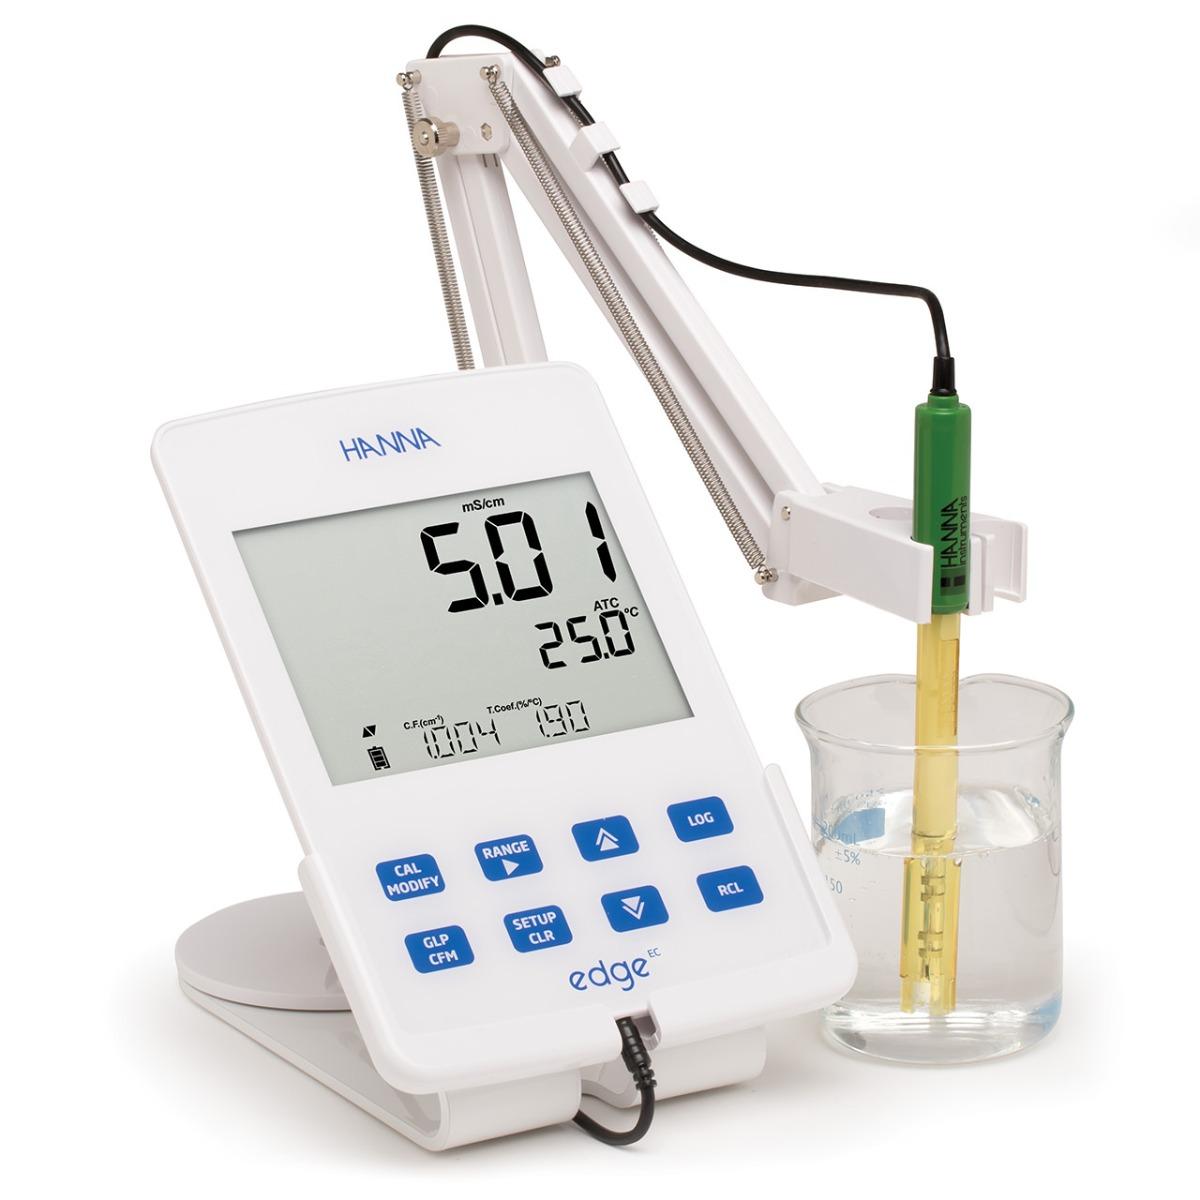 edge Conductivity/TDS/Salinity meter (in cradle)